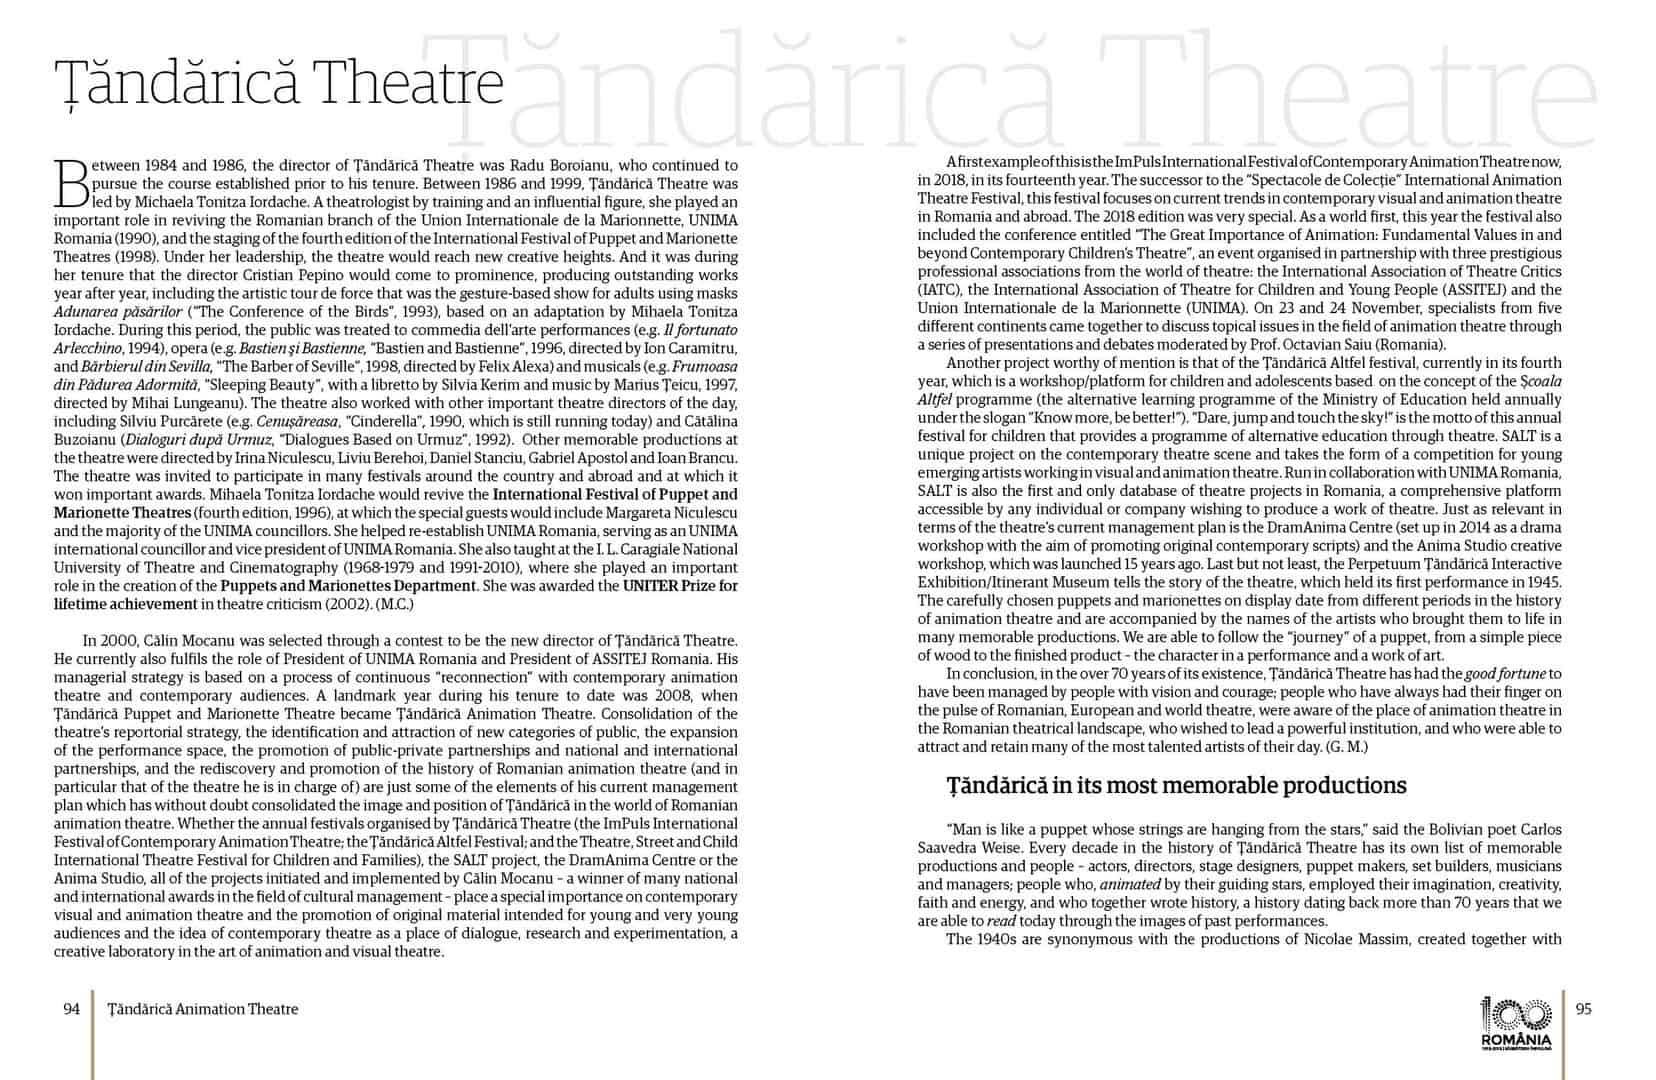 Album-Teatrul-de-Animatie-in-Romania-eng-final_Page_048